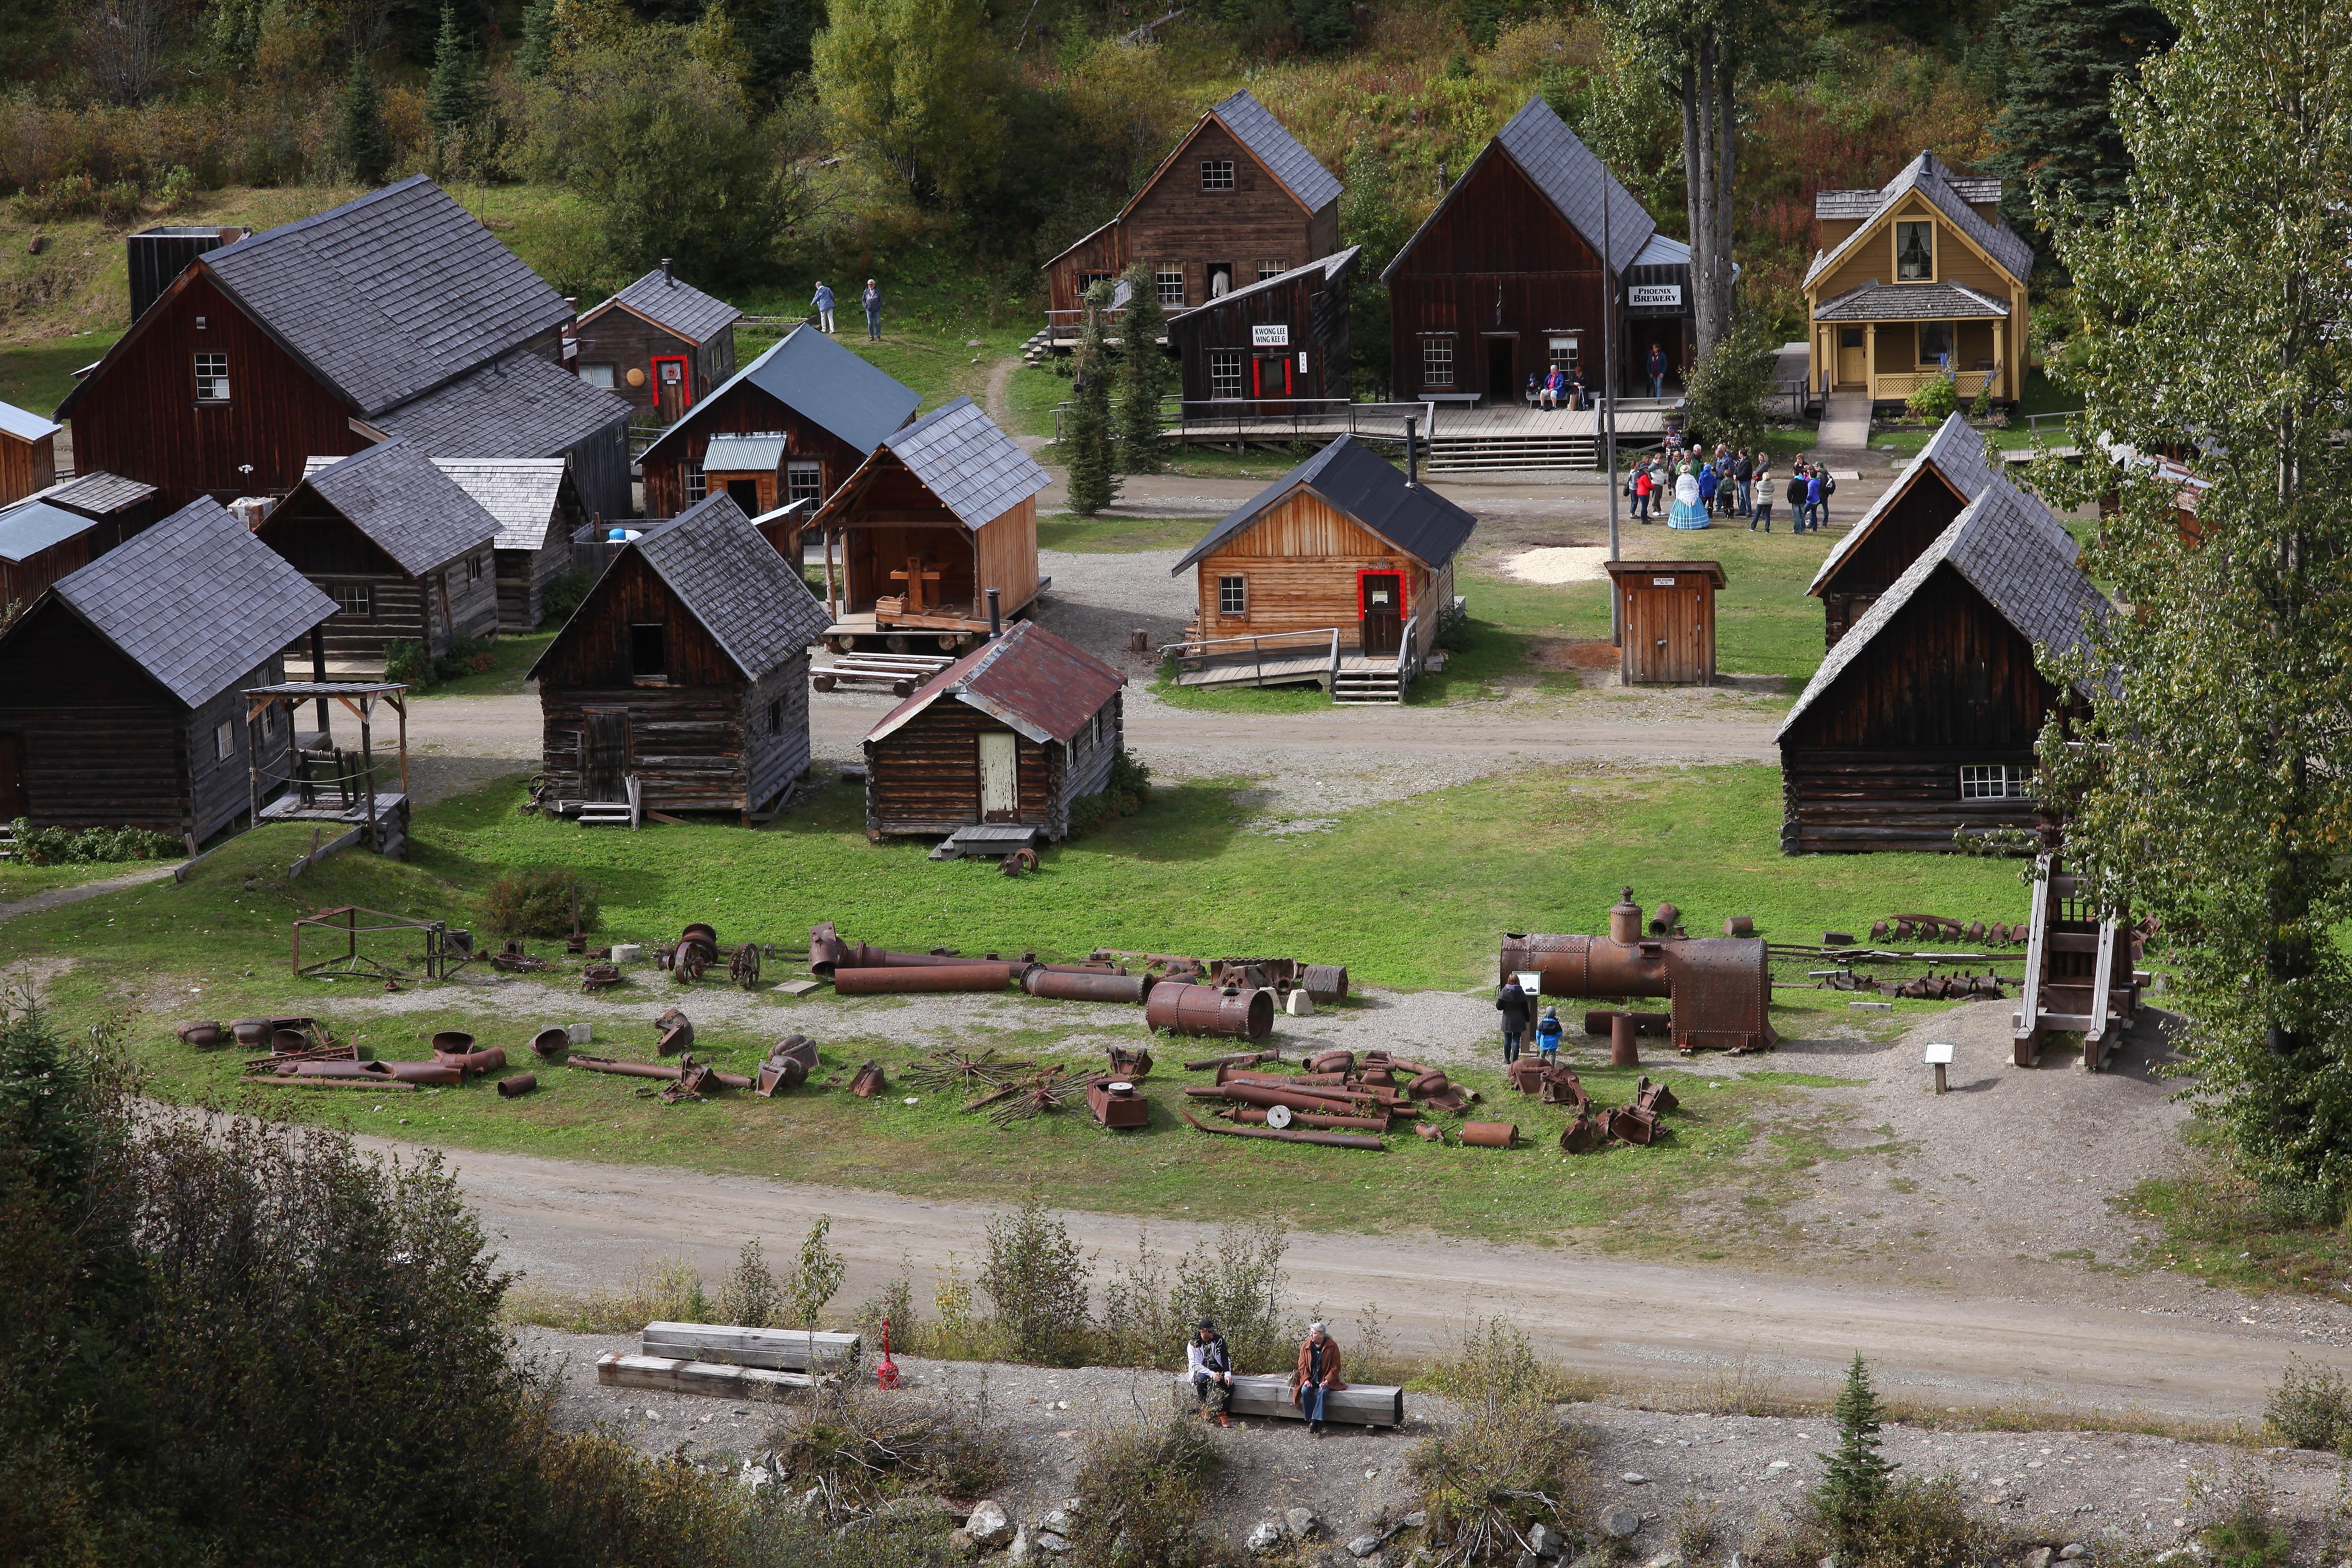 Free Images Farm House Home Hut Village Cottage Places Of